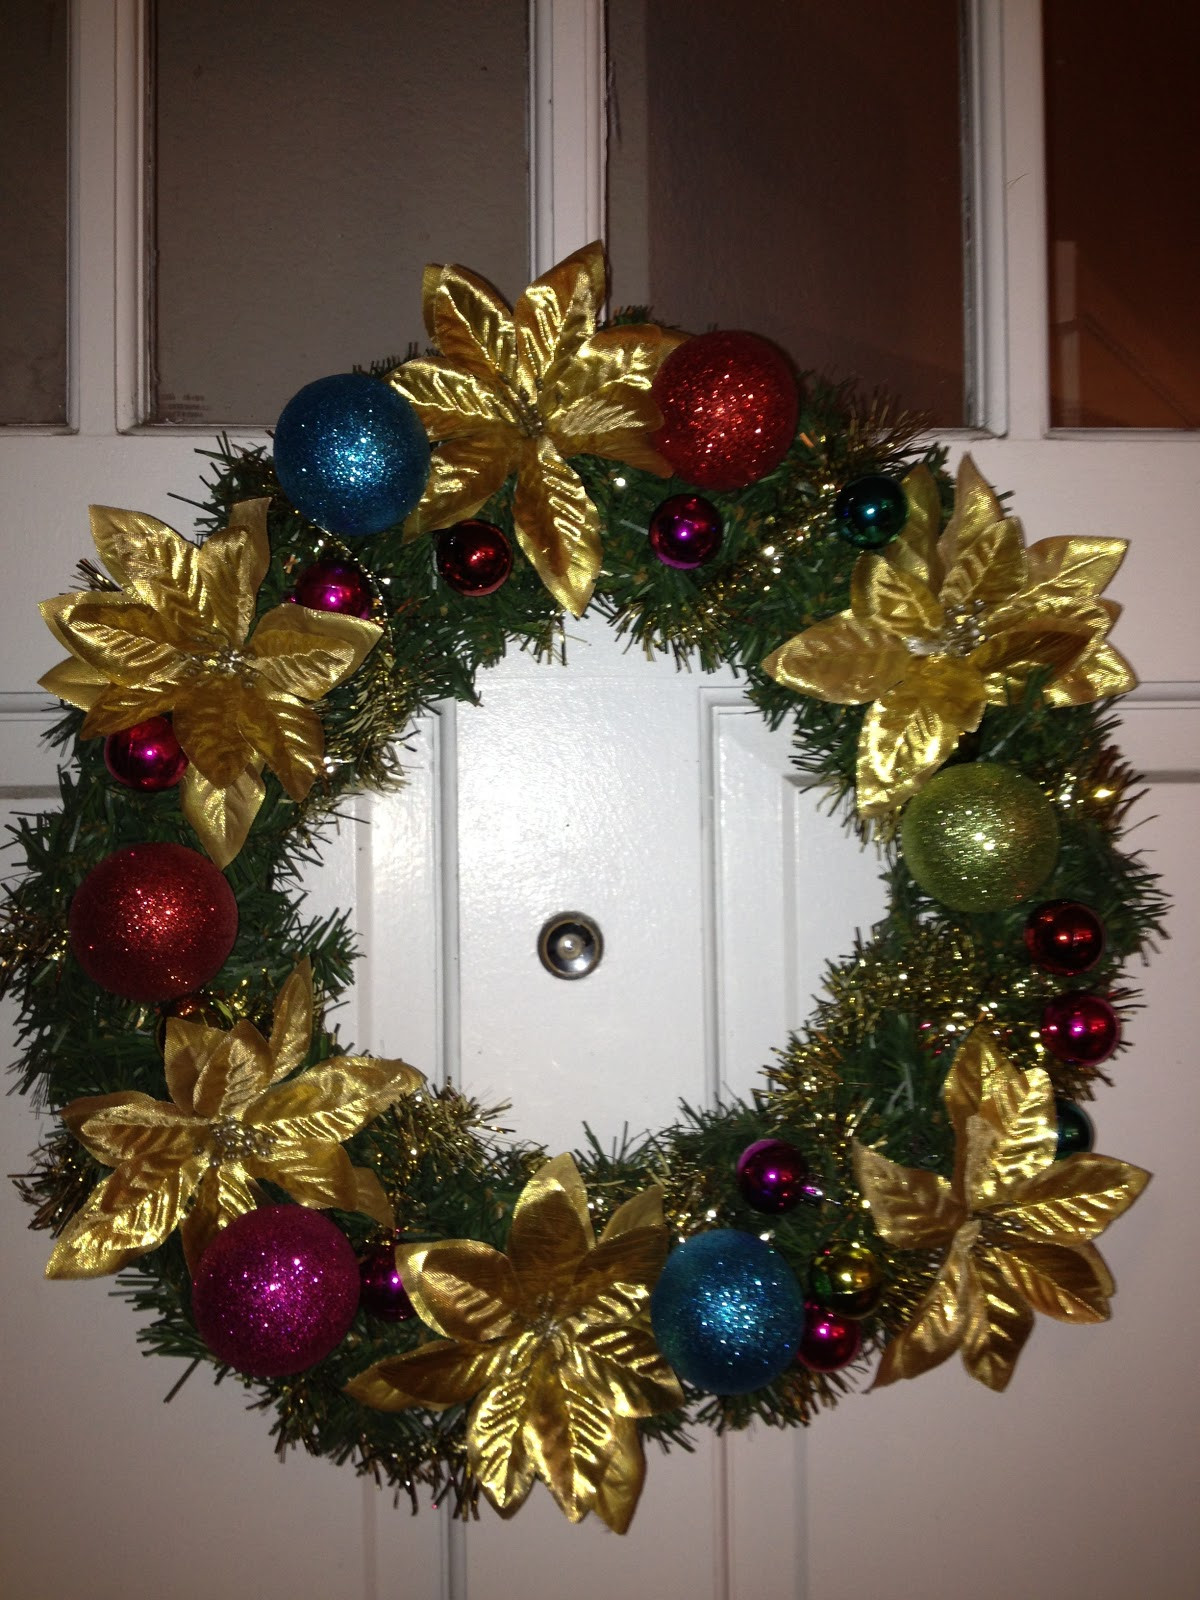 DIY Christmas Wreath Ideas  DIY Christmas Wreaths $5 Project Decorating and Craft